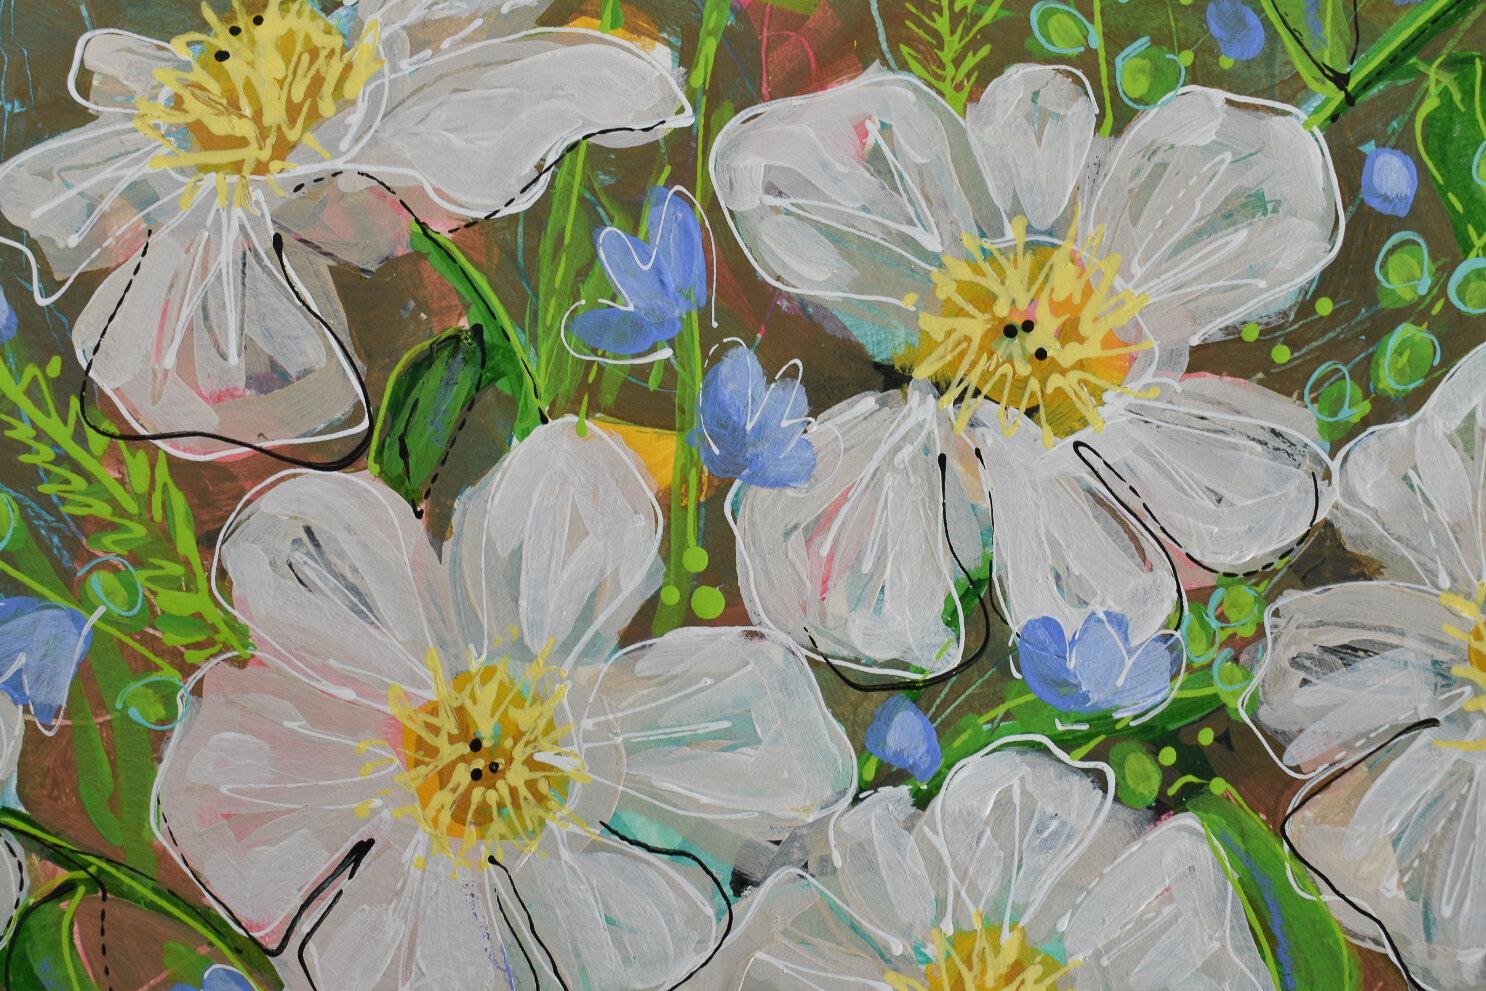 boho_painting_art_poppies_daisyfaithart_6.jpg